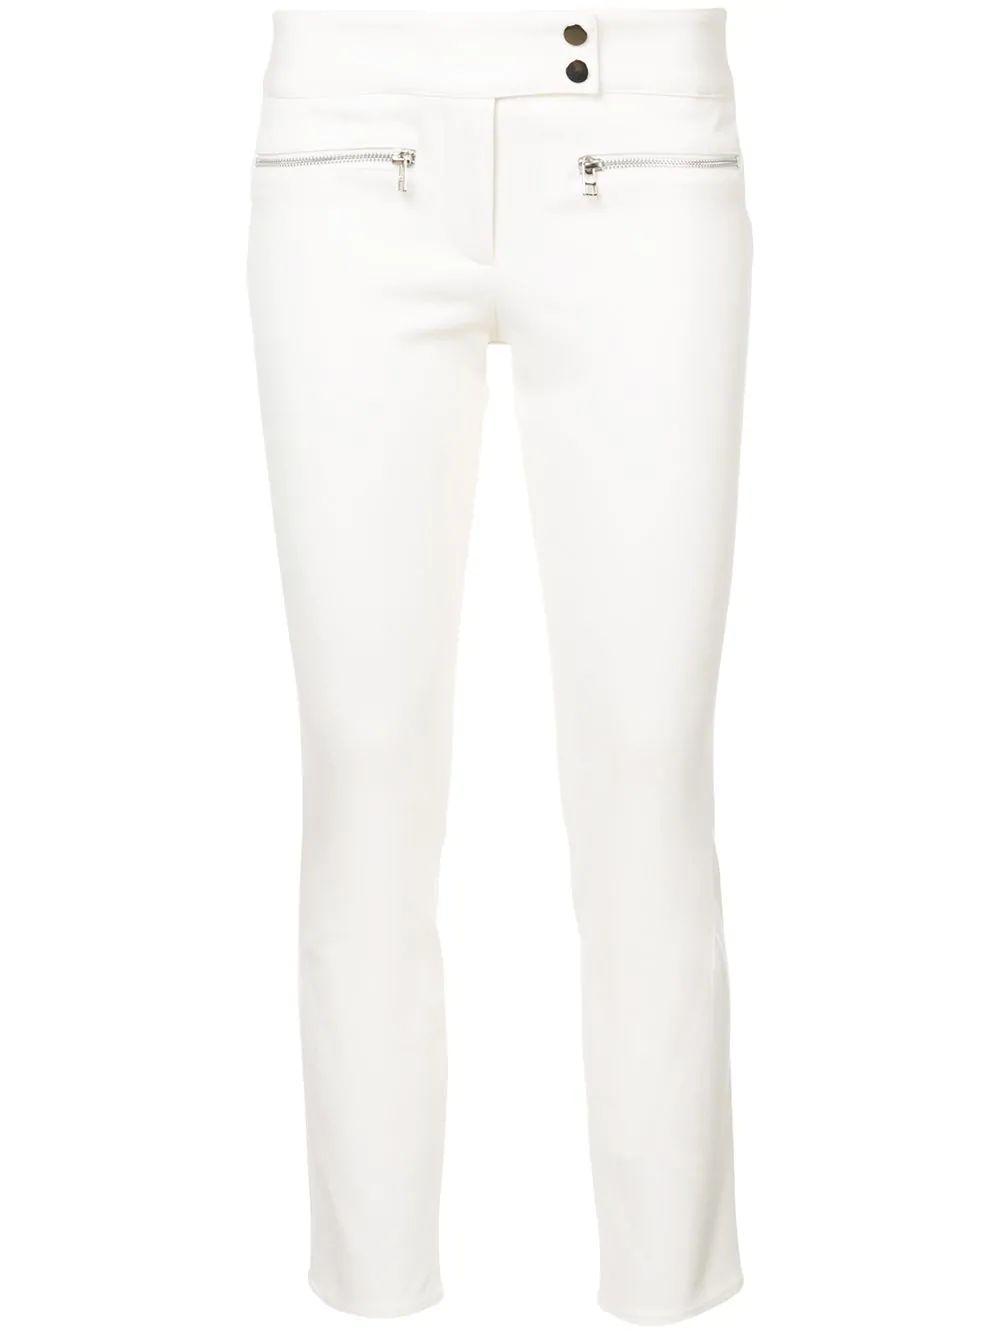 Cropped Bi Stretch Twill Pant Item # RE17-BST6200-S18